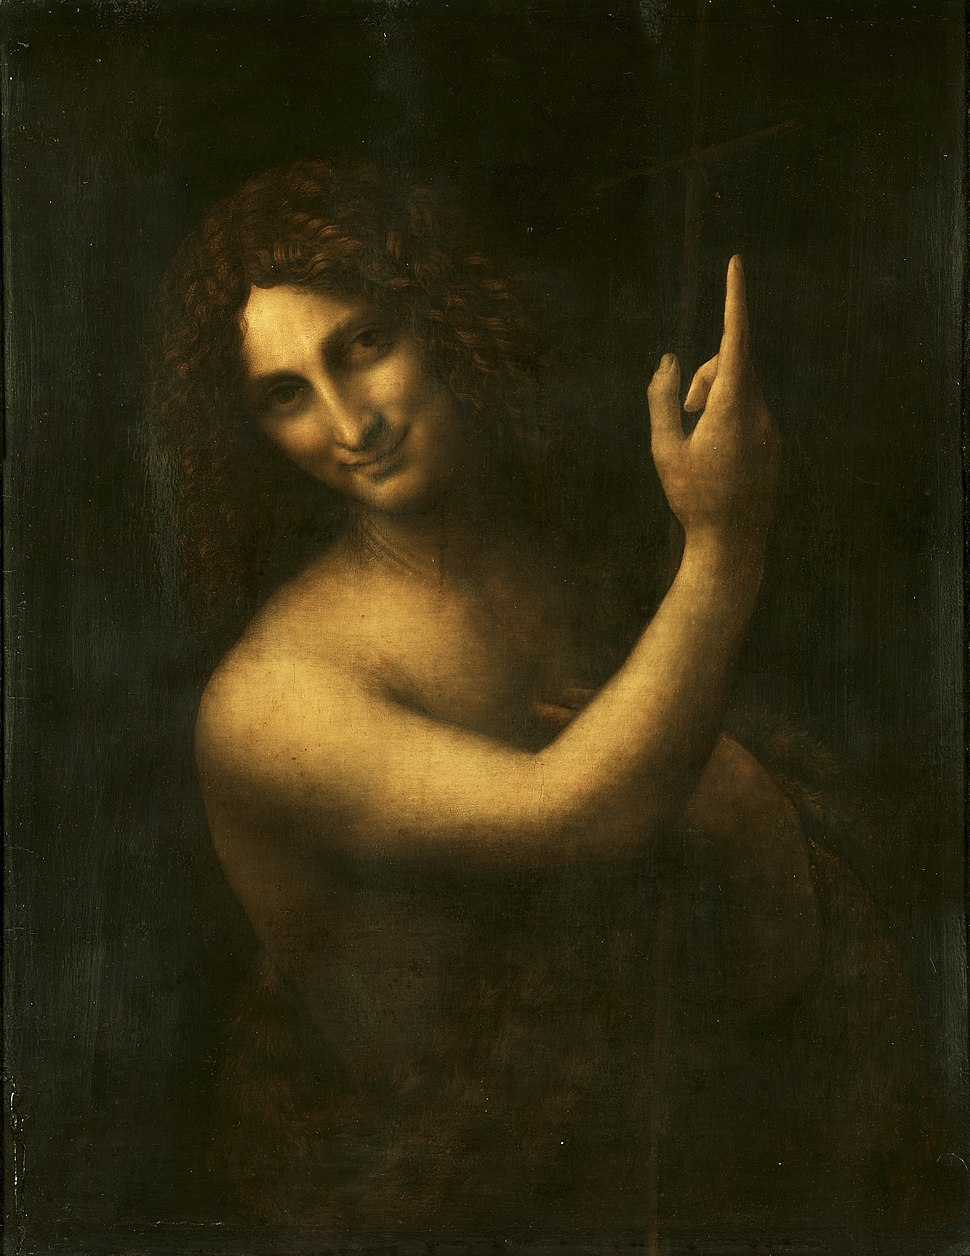 Leonardo da Vinci - Saint John the Baptist C2RMF retouched